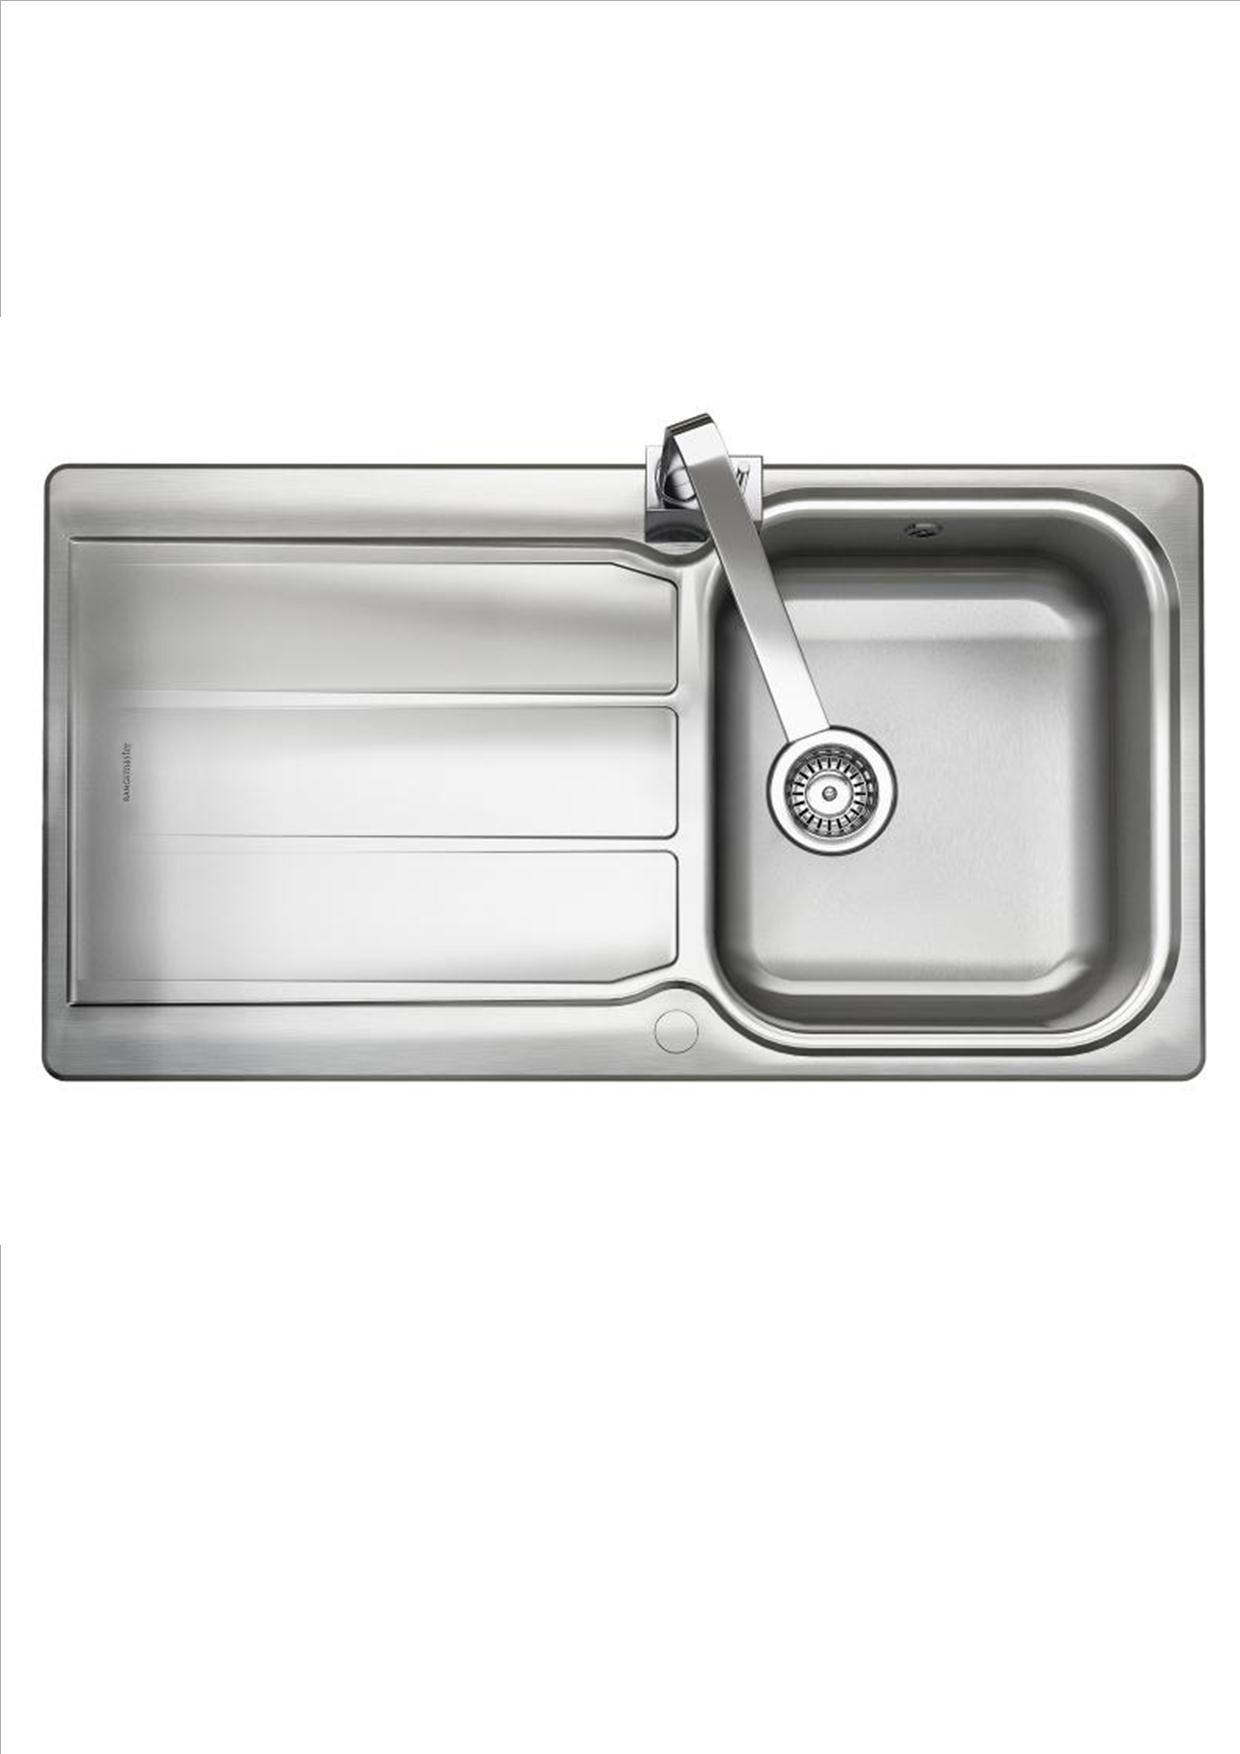 Rangemaster Glendale Single Bowl Sink - GL9501